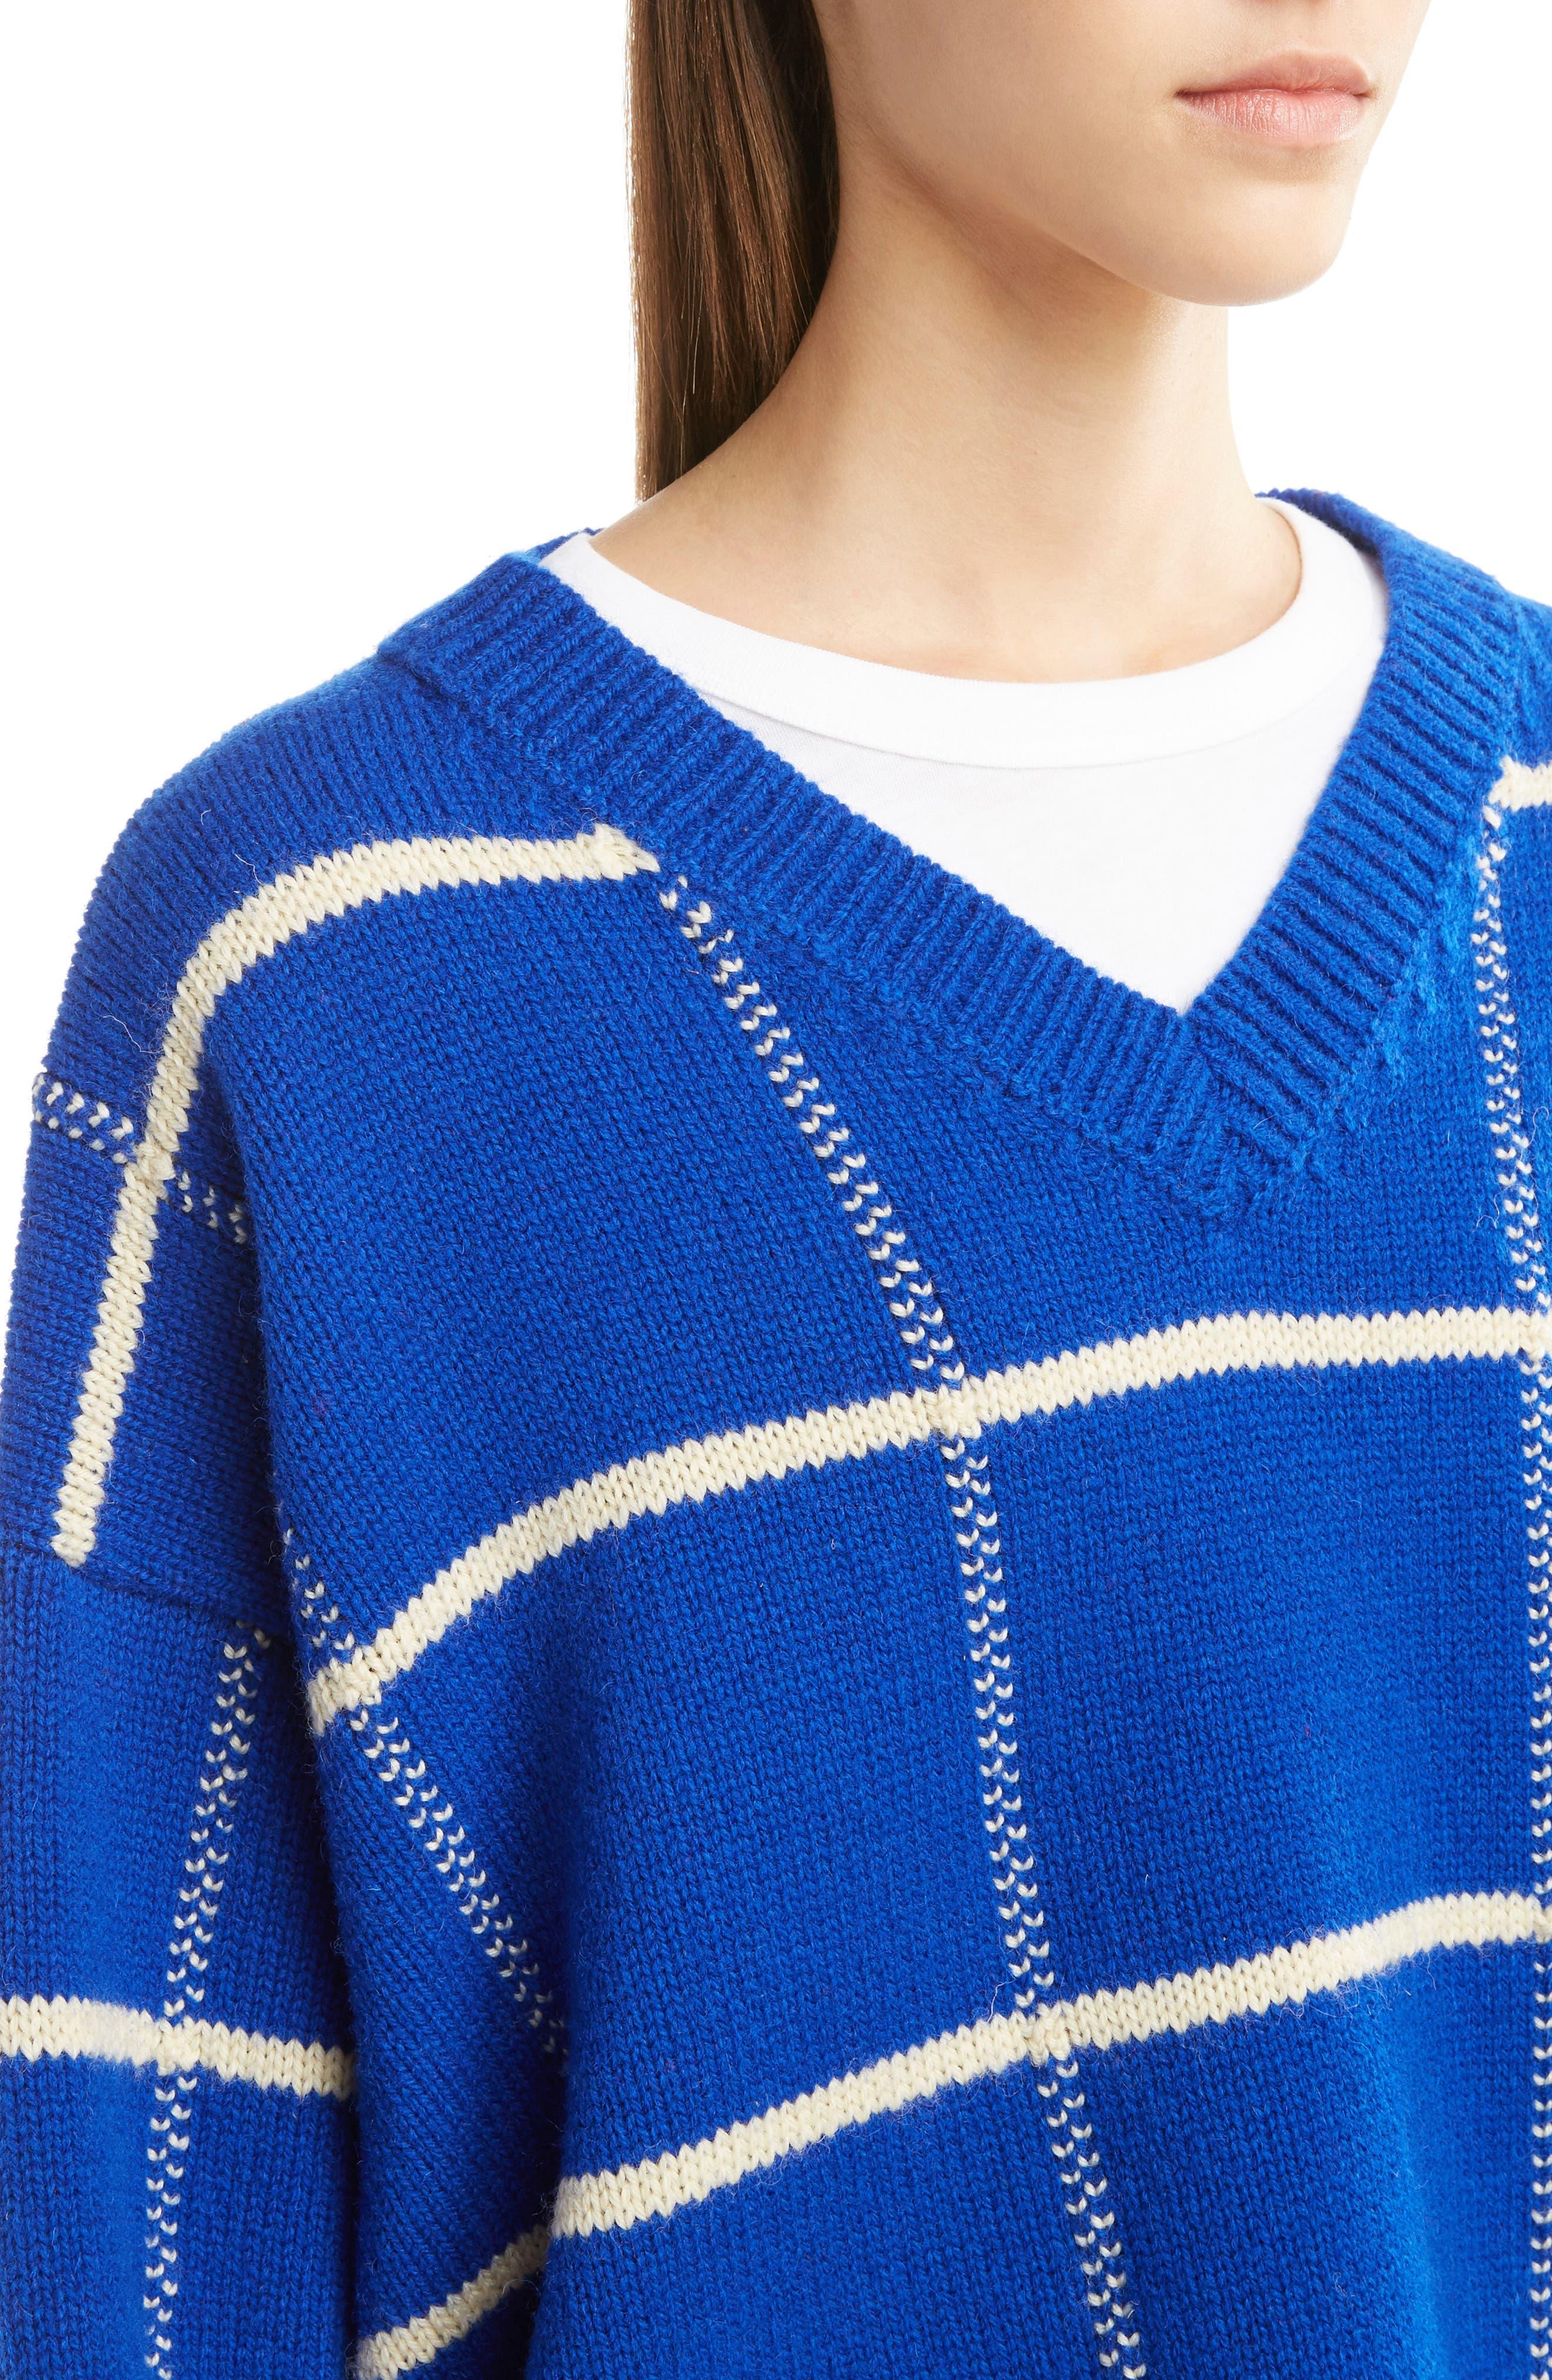 Windowpane Knit Wool Sweater,                             Alternate thumbnail 5, color,                             King Blue